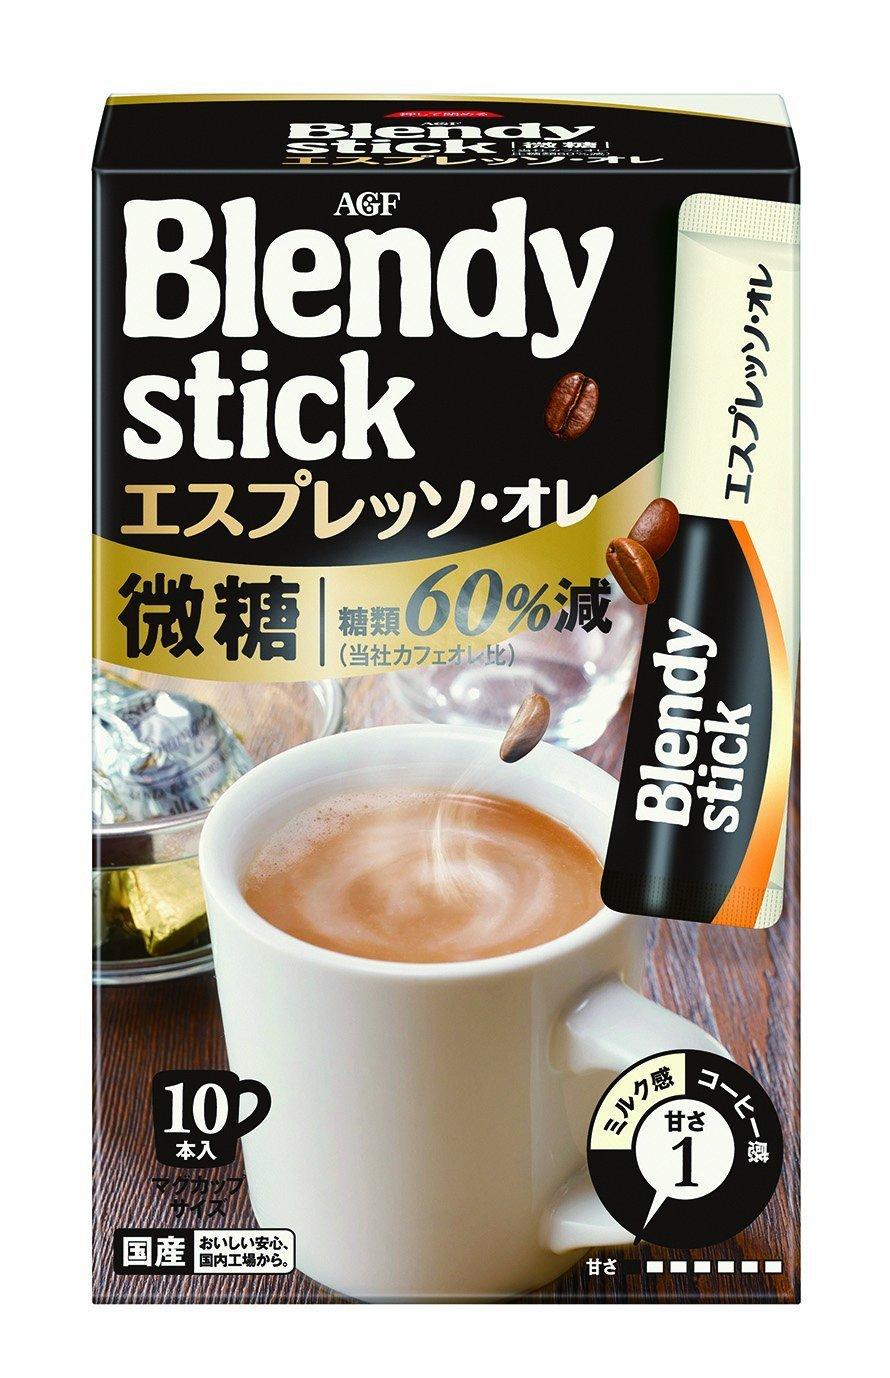 AGF Blebdy stick 三合一 義式歐蕾咖啡 ~  好康折扣